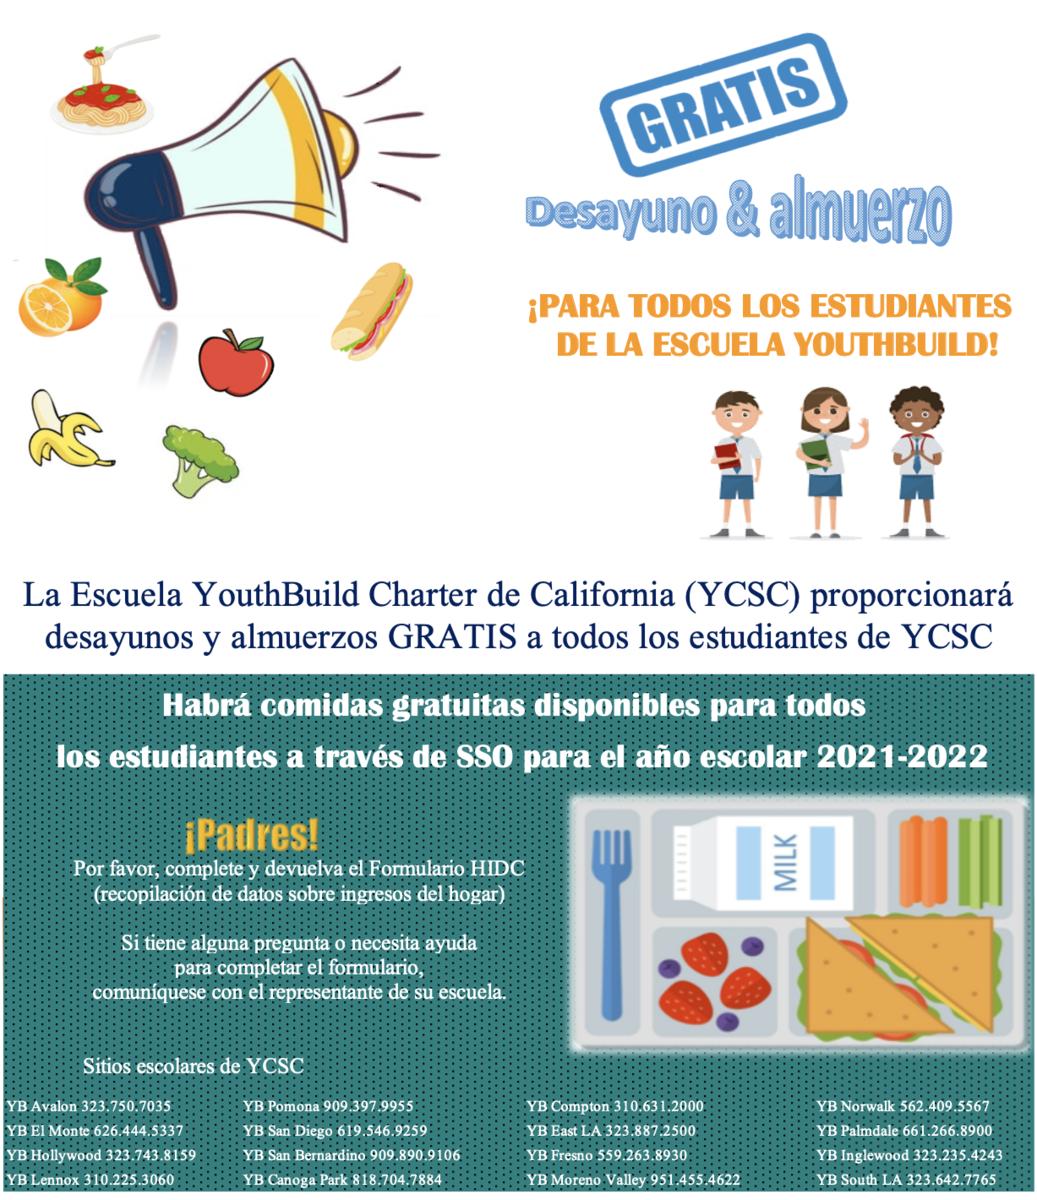 Spanish Language version of free meal flyer